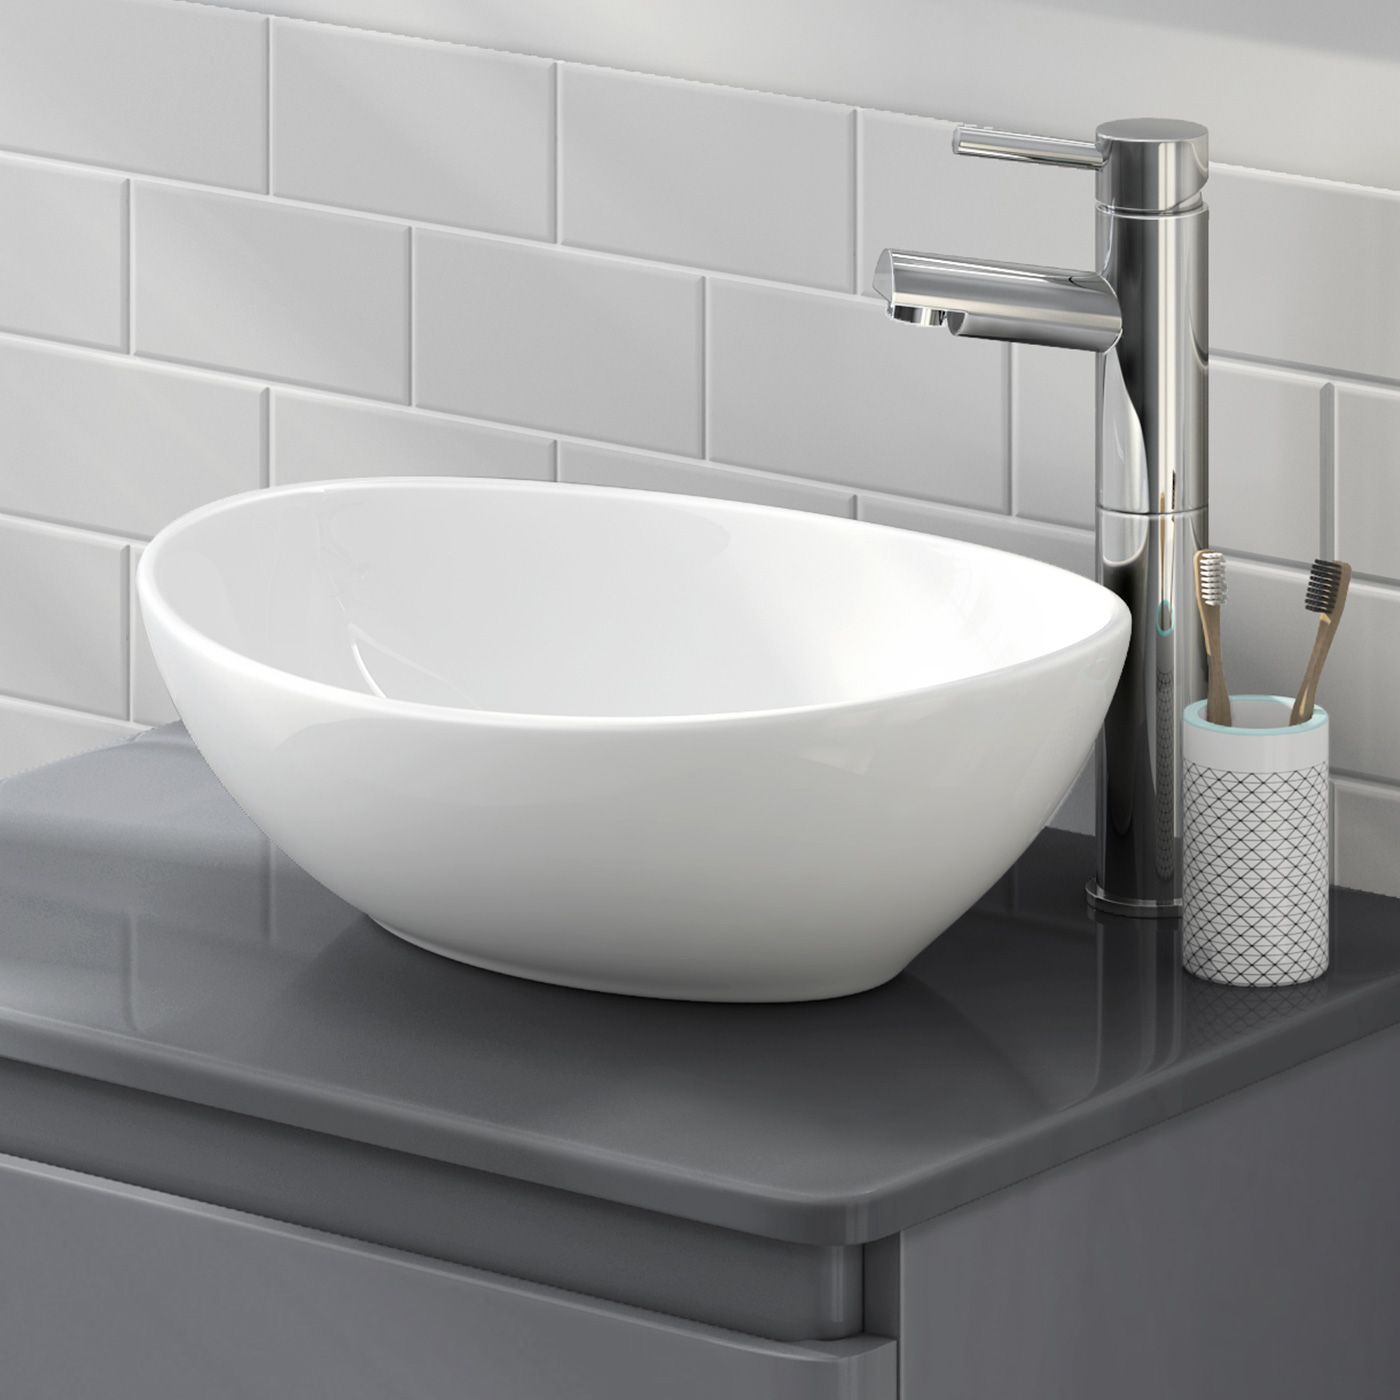 Camila Counter Top Basin   Basin, Counter top and Bathroom basin